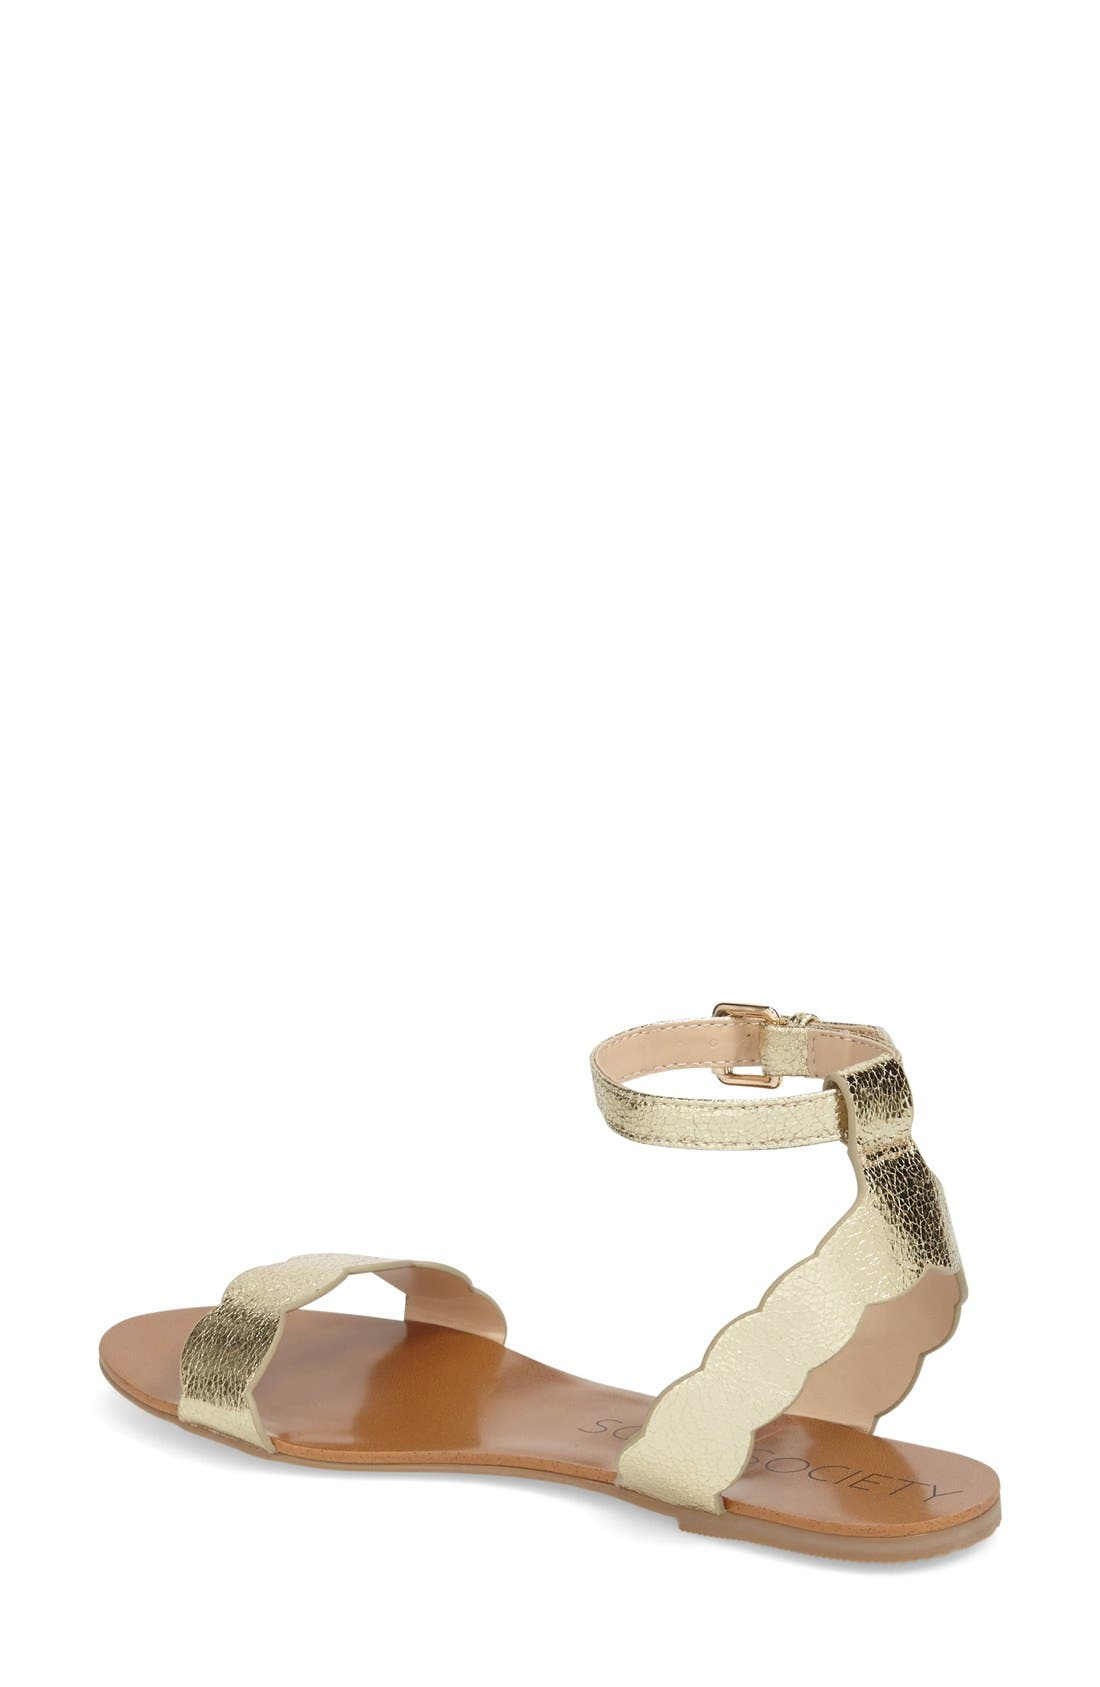 'Odette' Scalloped Ankle Strap Flat Sandal,                             Alternate thumbnail 14, color,